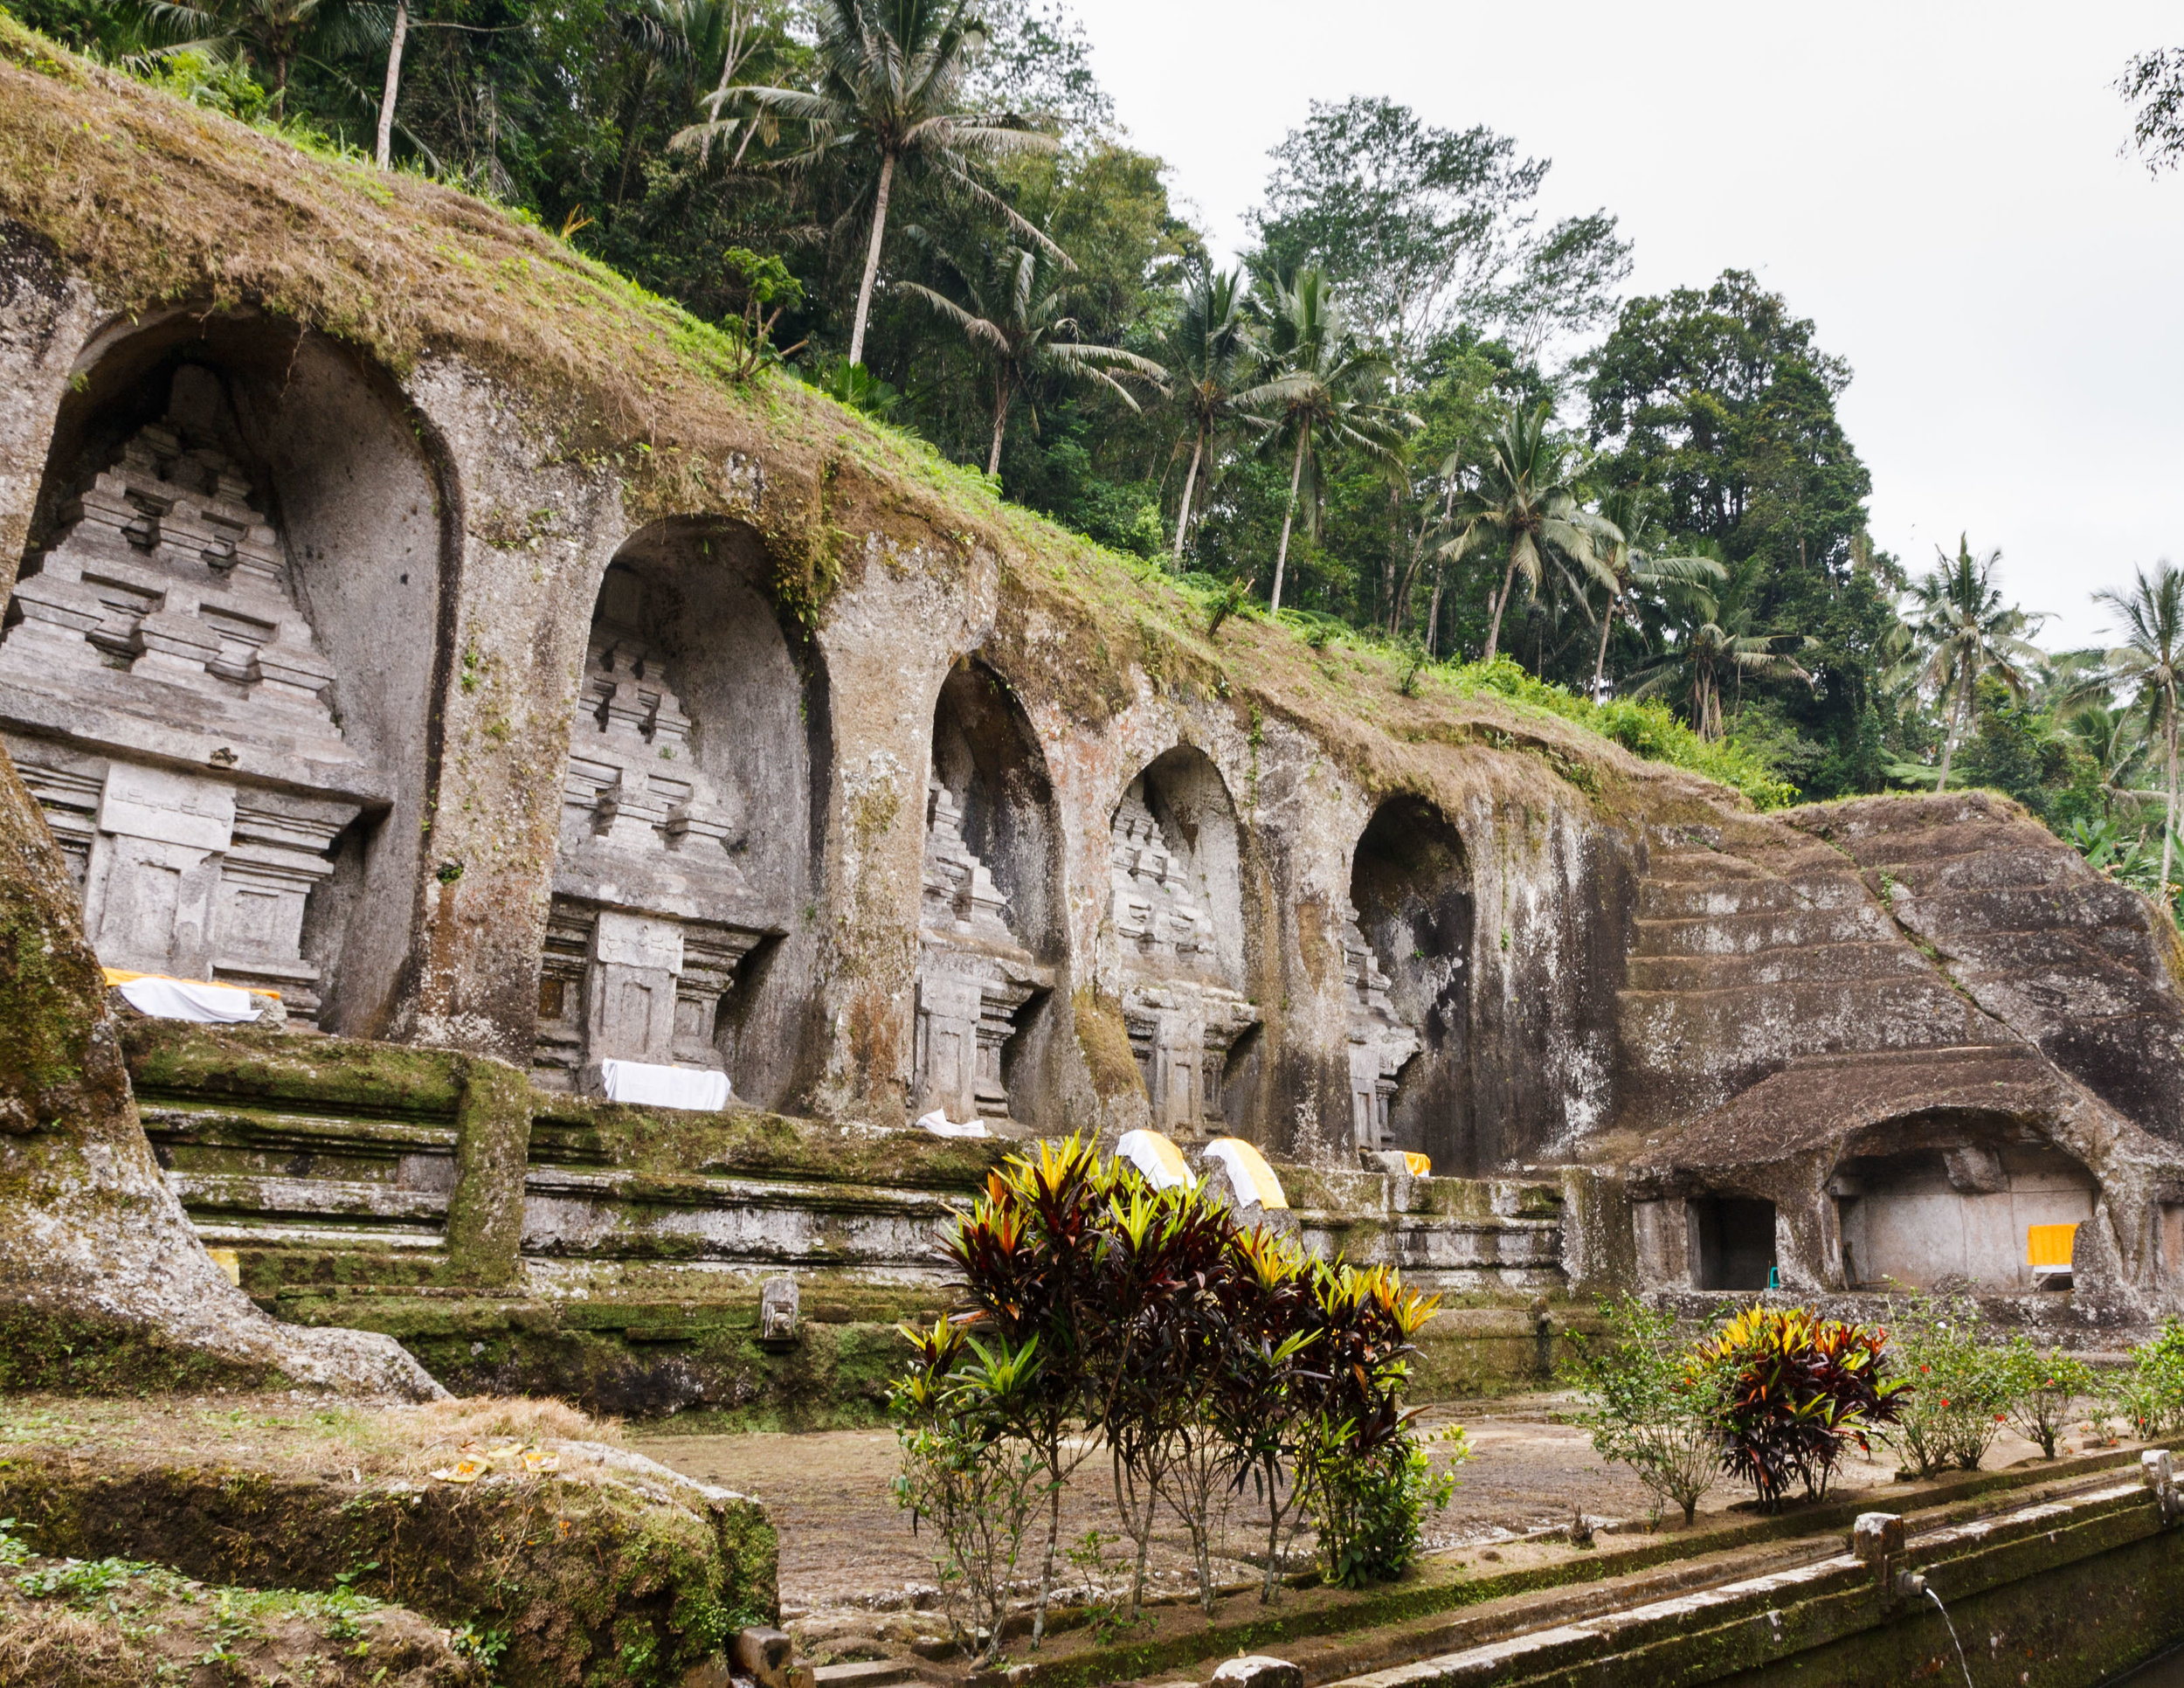 Bali Itinerary 7 Days: Pura Gunung Kawi